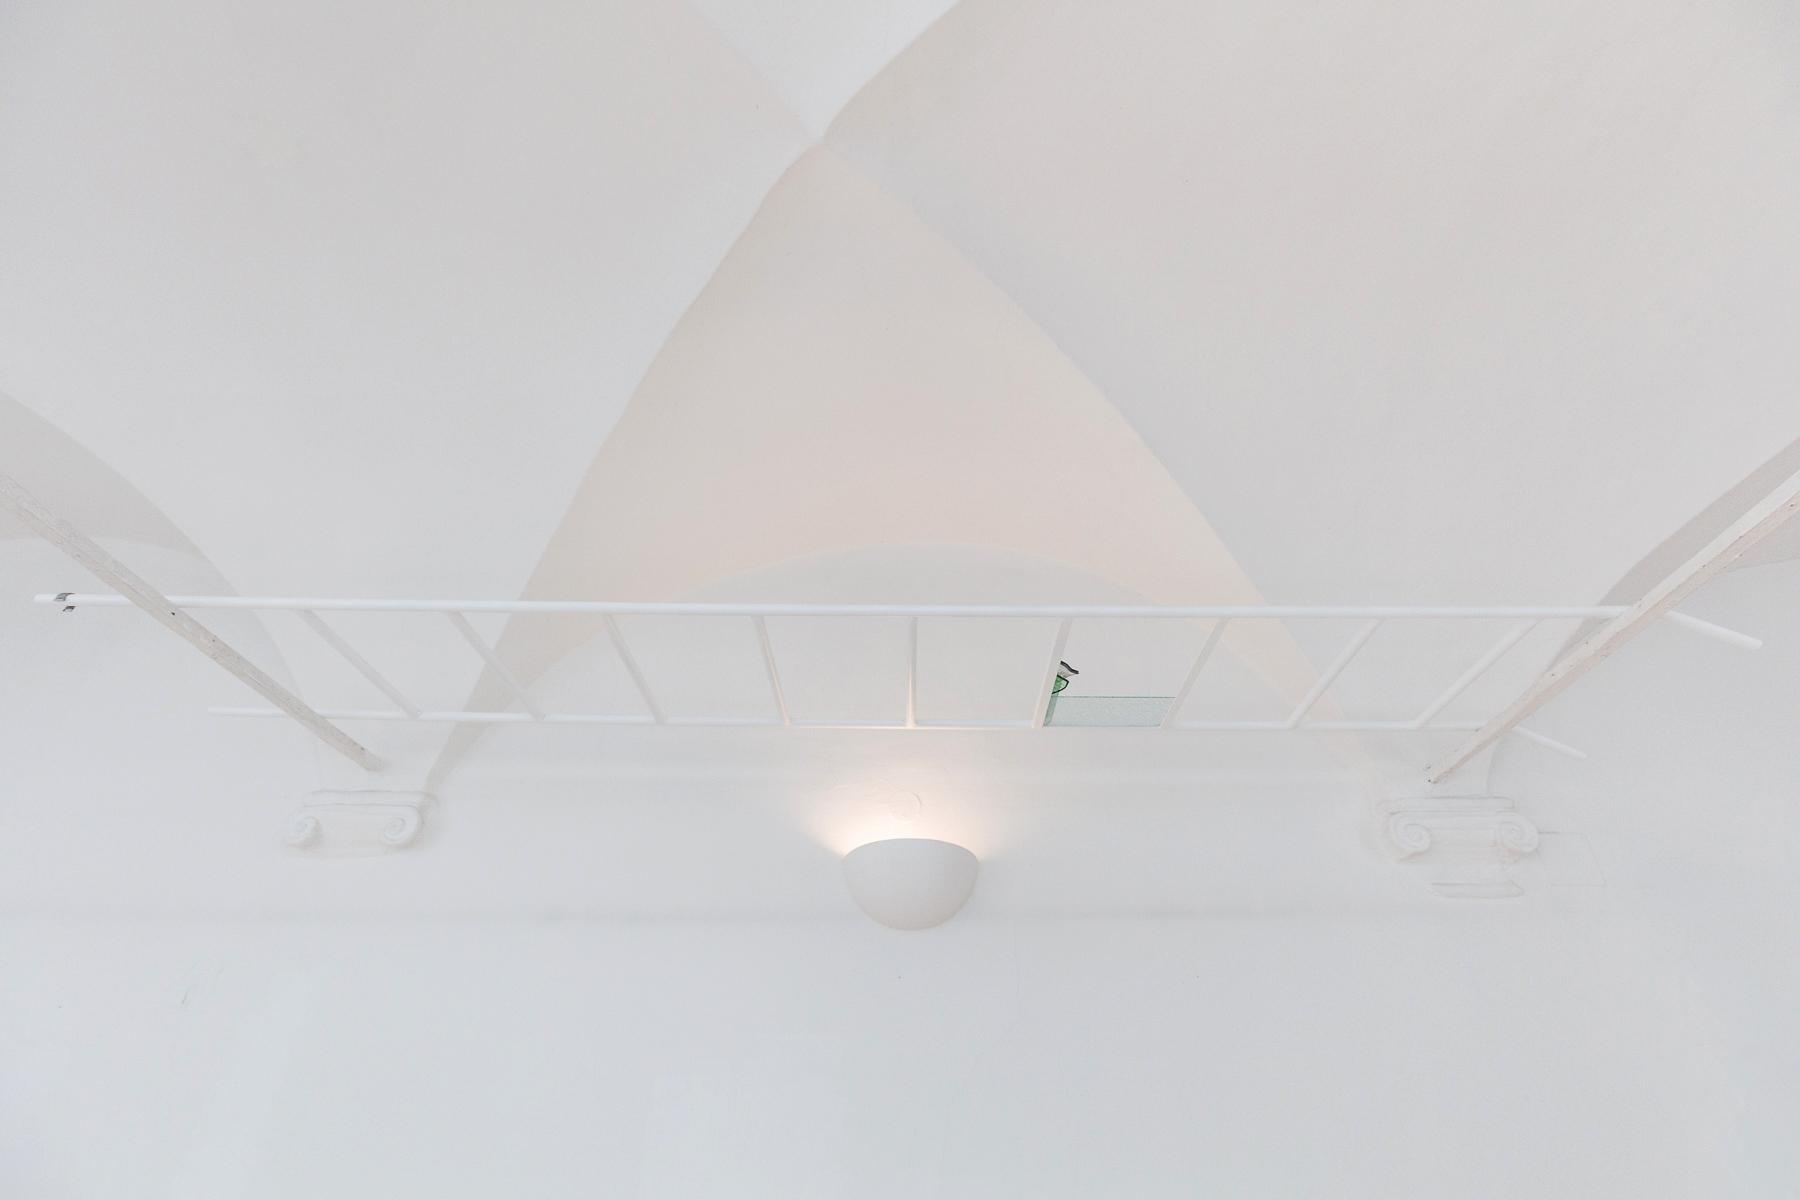 007_2019_SAleryani_SORT_Like a ladder from horizon to horizon_04_web.jpg